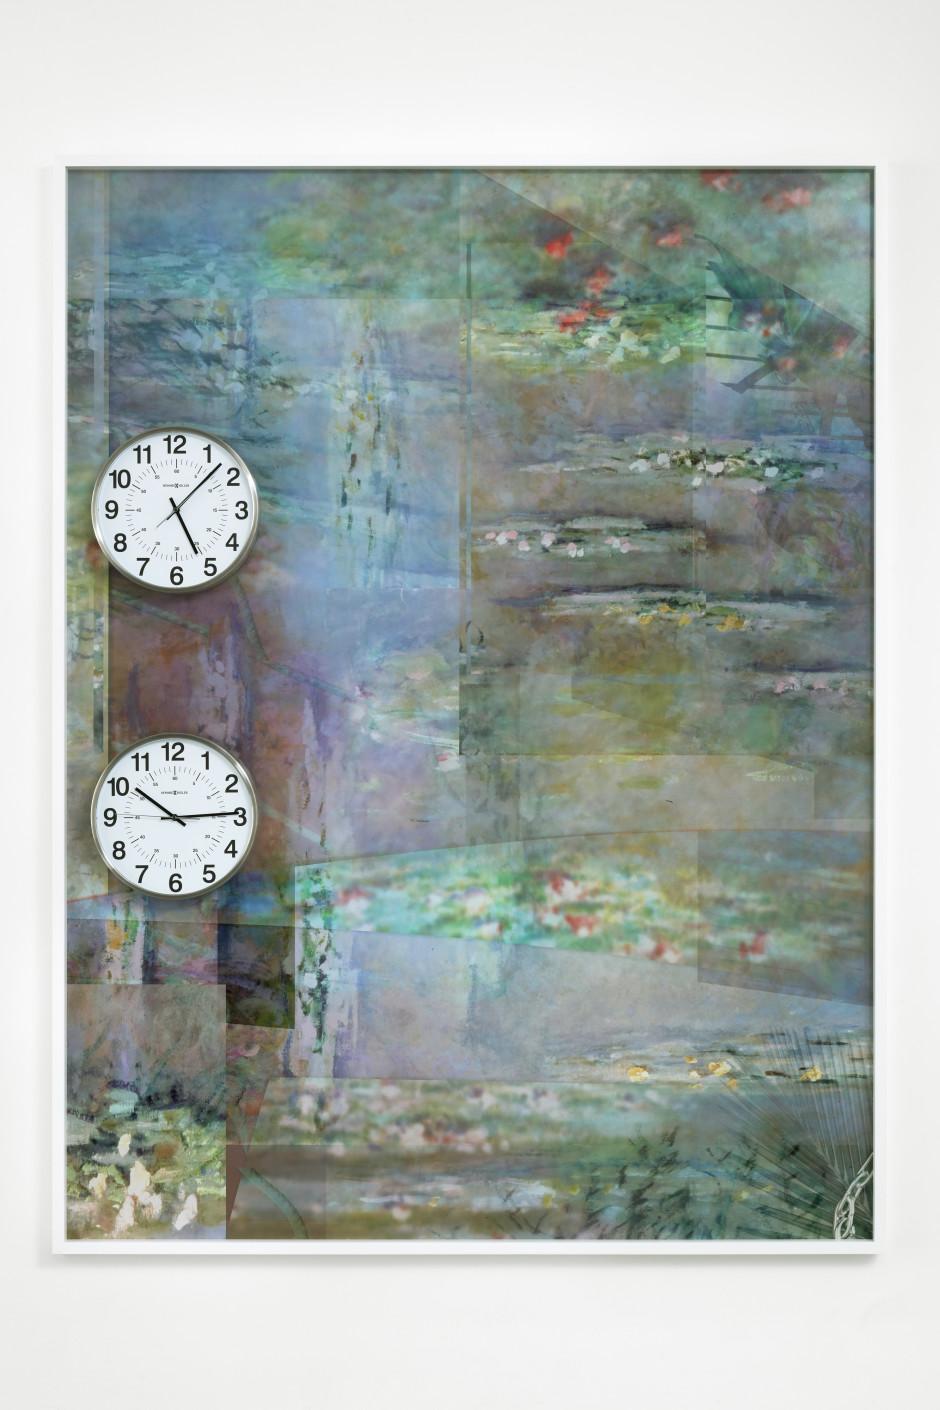 Nymphaea violacea, 2018  archival pigment print, clocks  205 x 156 x 5.7 cm / 80 ¾ x 61 ⅜ x 2 ¼ in